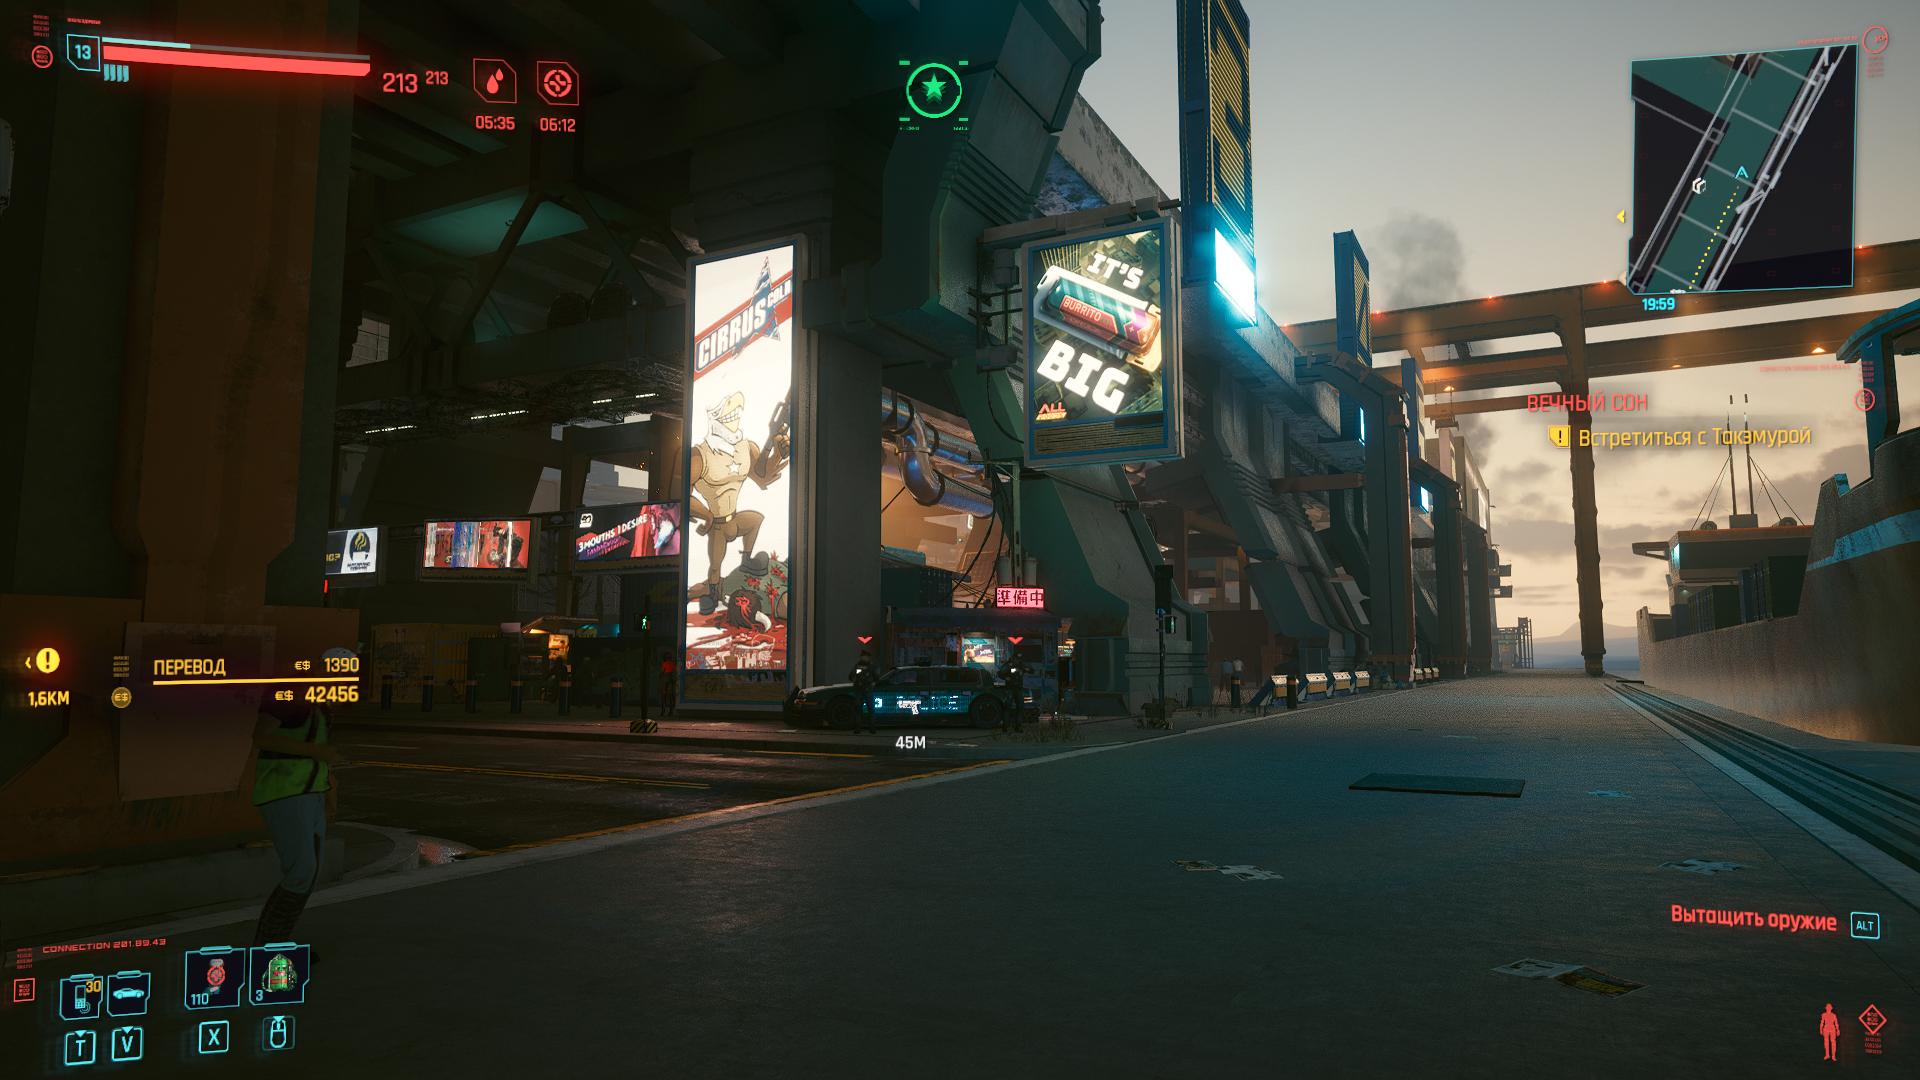 Cyberpunk 2077 Screenshot 2021.05.03 - 00.04.01.24.png - Cyberpunk 2077